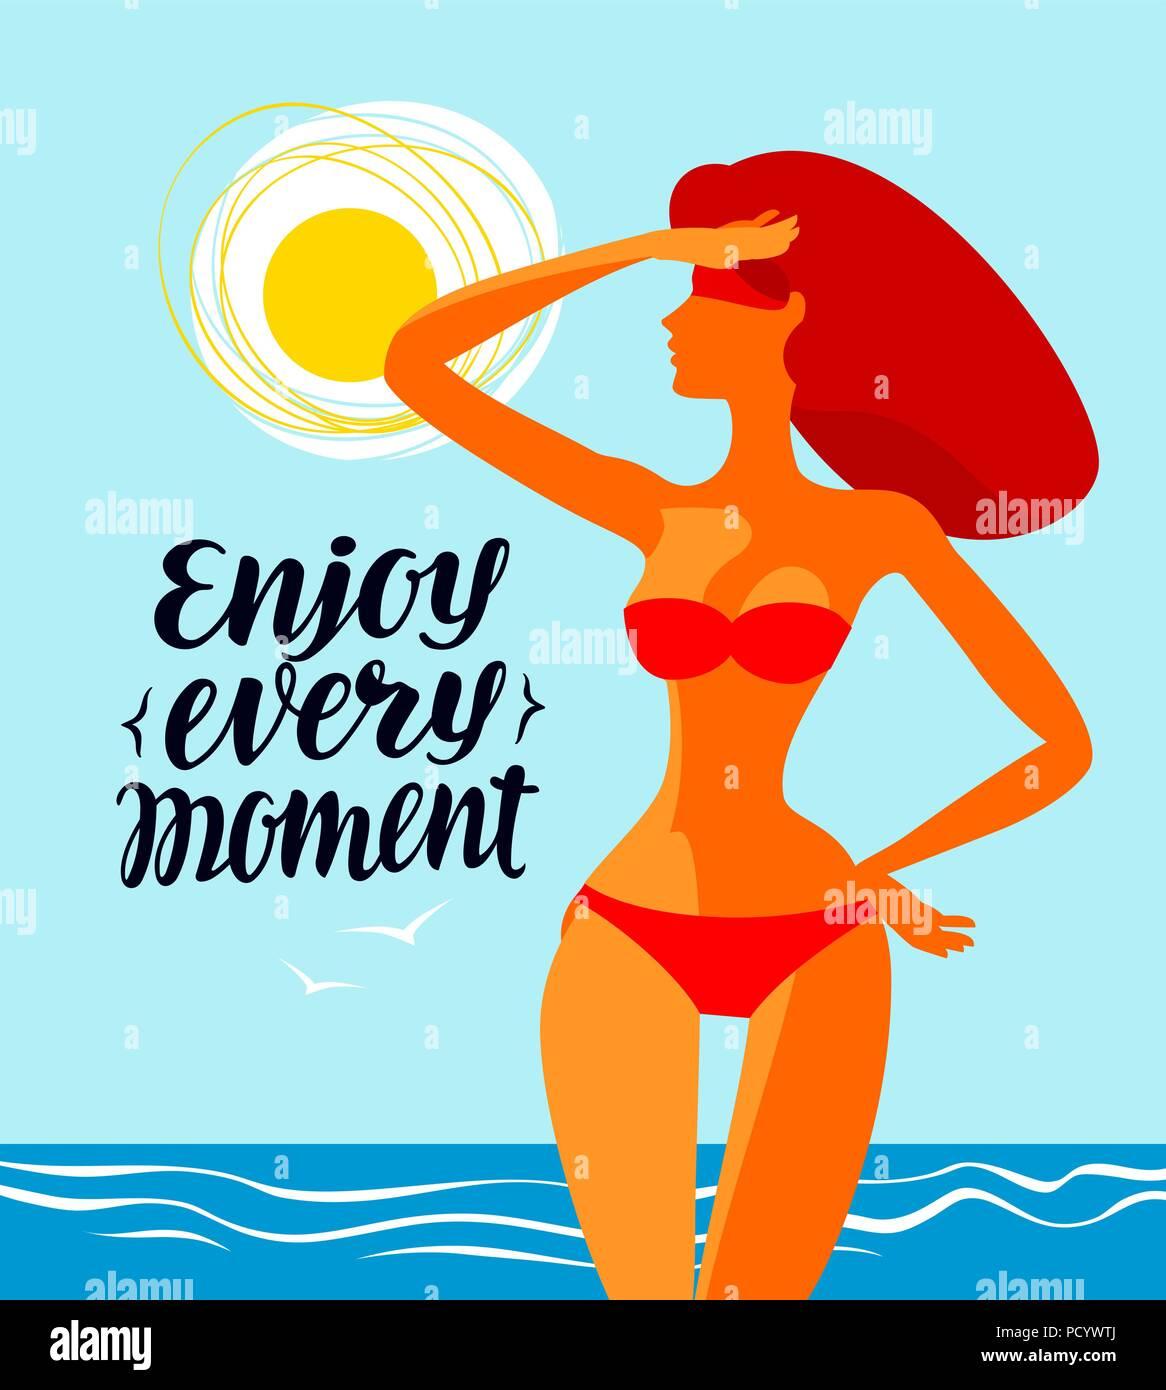 Enjoy every moment, banner. Travel, beach vector illustration - Stock Vector